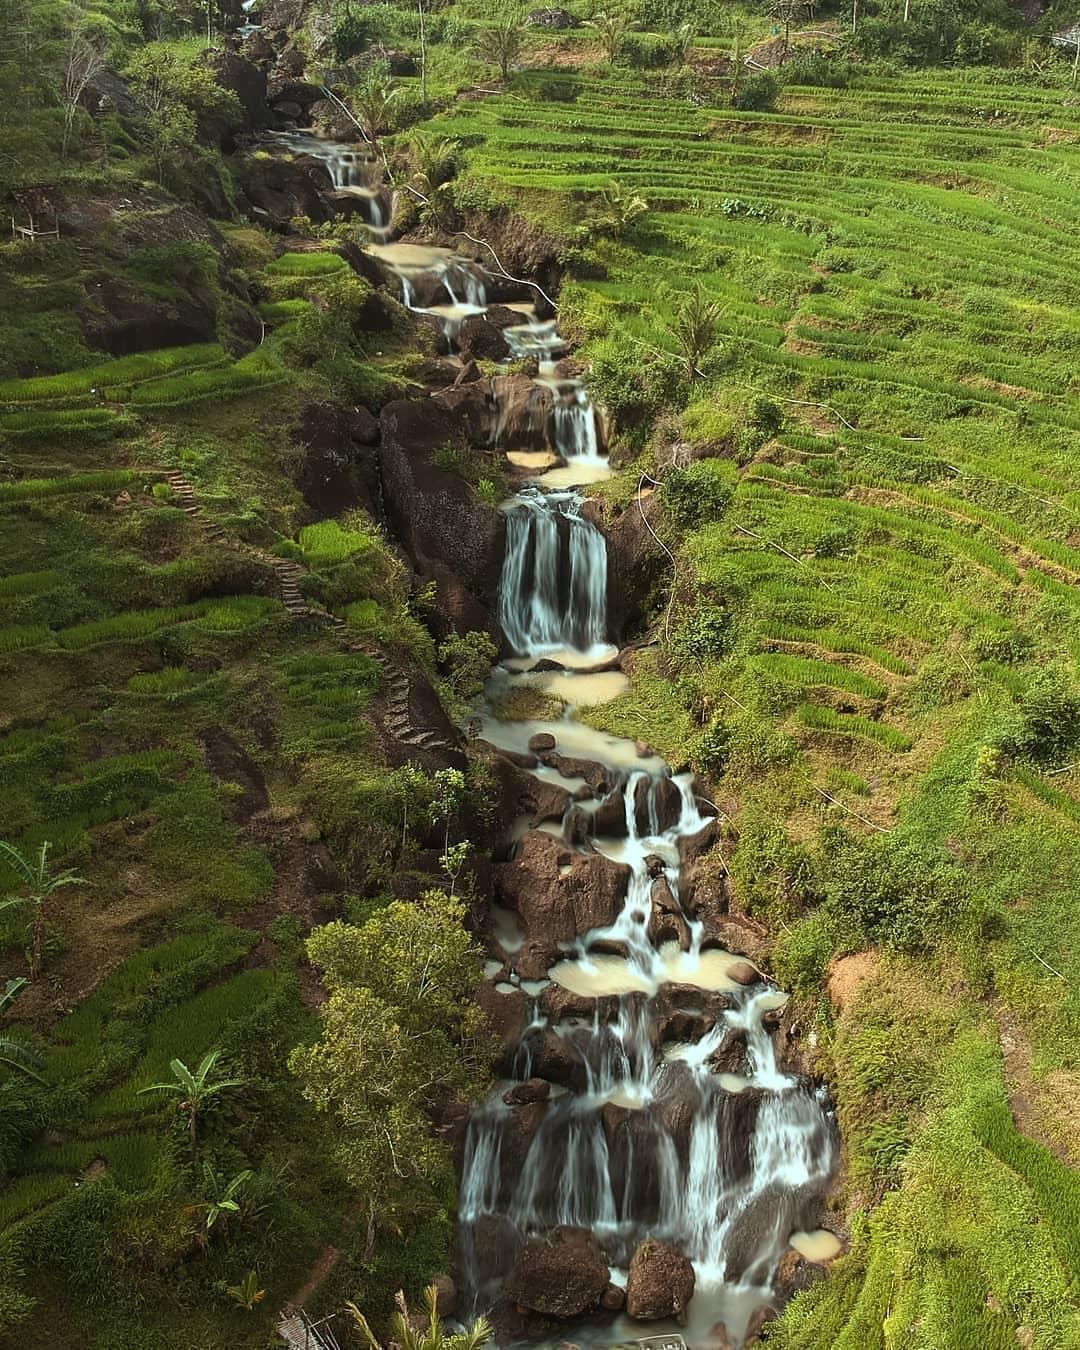 Air Terjun Kedung Kandang, Nglanggeran, Gunungkidul, Yogyakarta | Foto: Fajar Budi/jogjapost.com